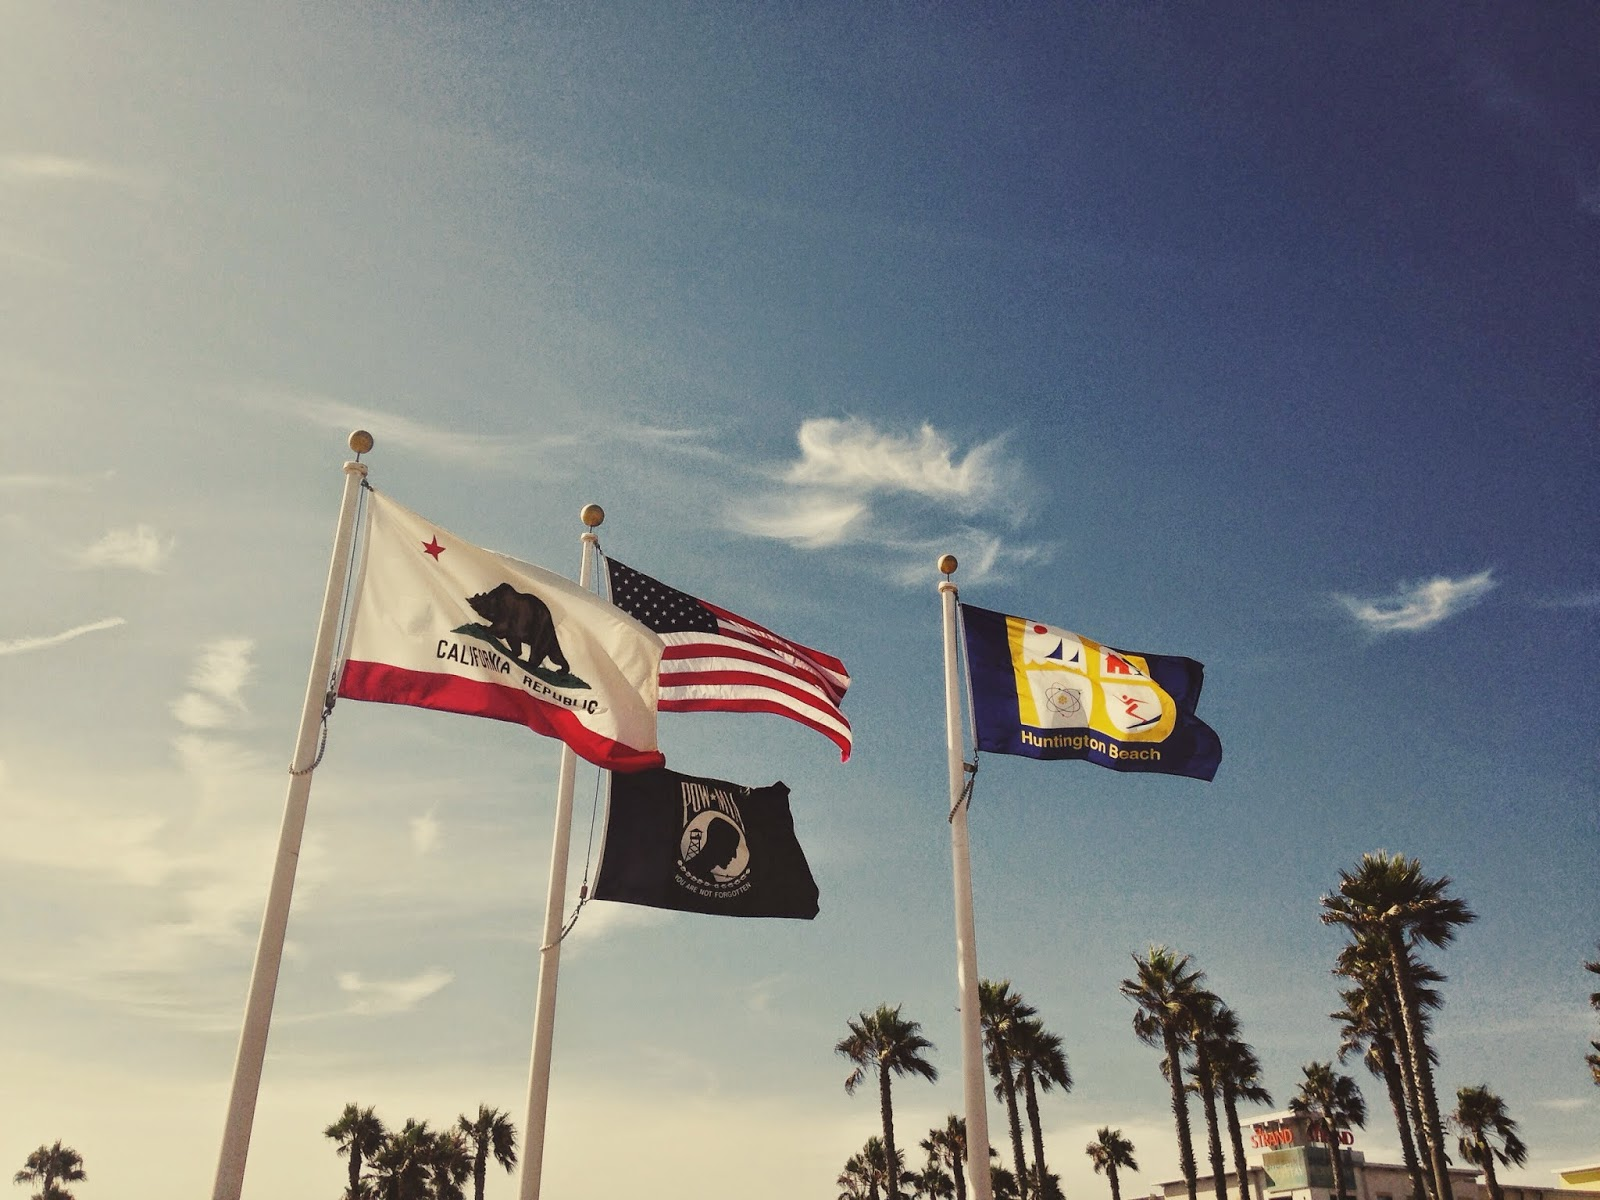 Courtney Tomesch Huntington Beach California